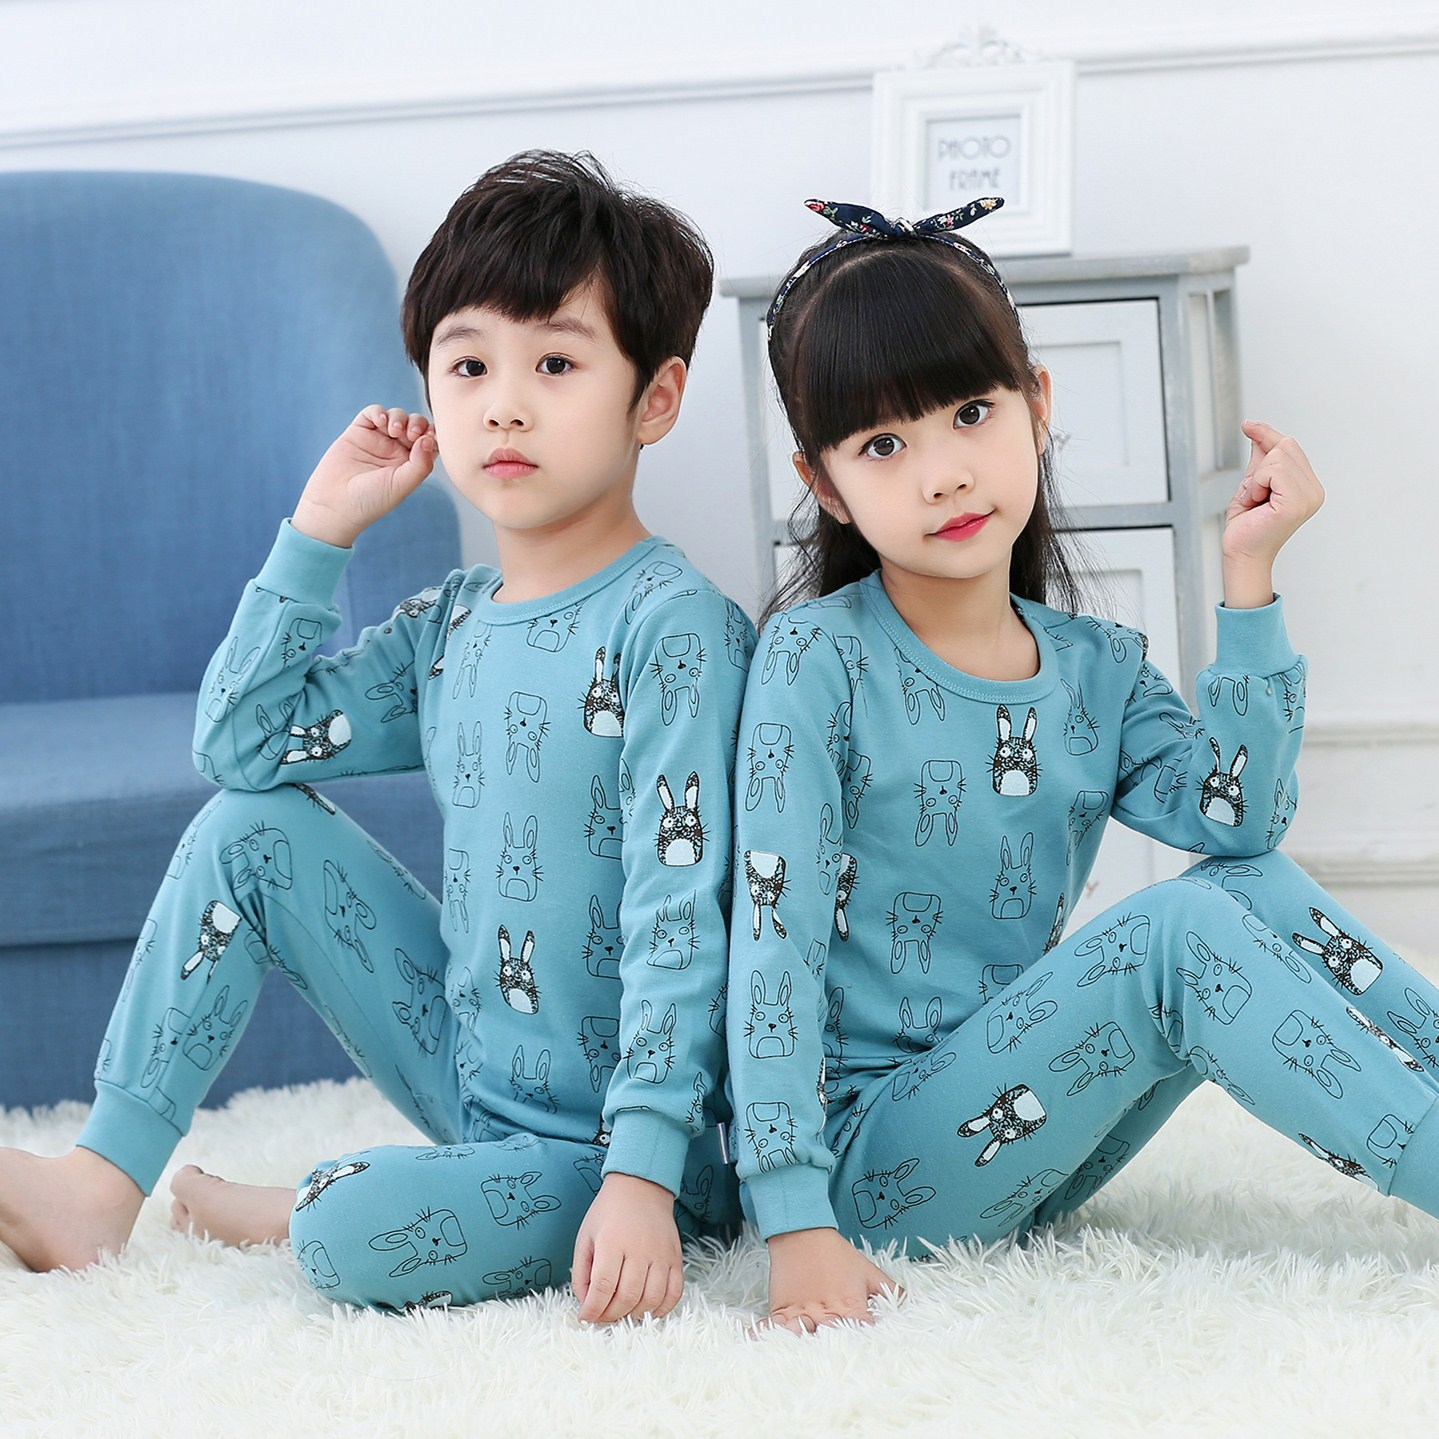 Enfants vêtements grands garçons filles Pyjamas licorne Pyjamas enfants vêtements de nuit en coton enfant en bas âge vêtements de nuit dessin animé pijamas enfant bébé Pyjamas